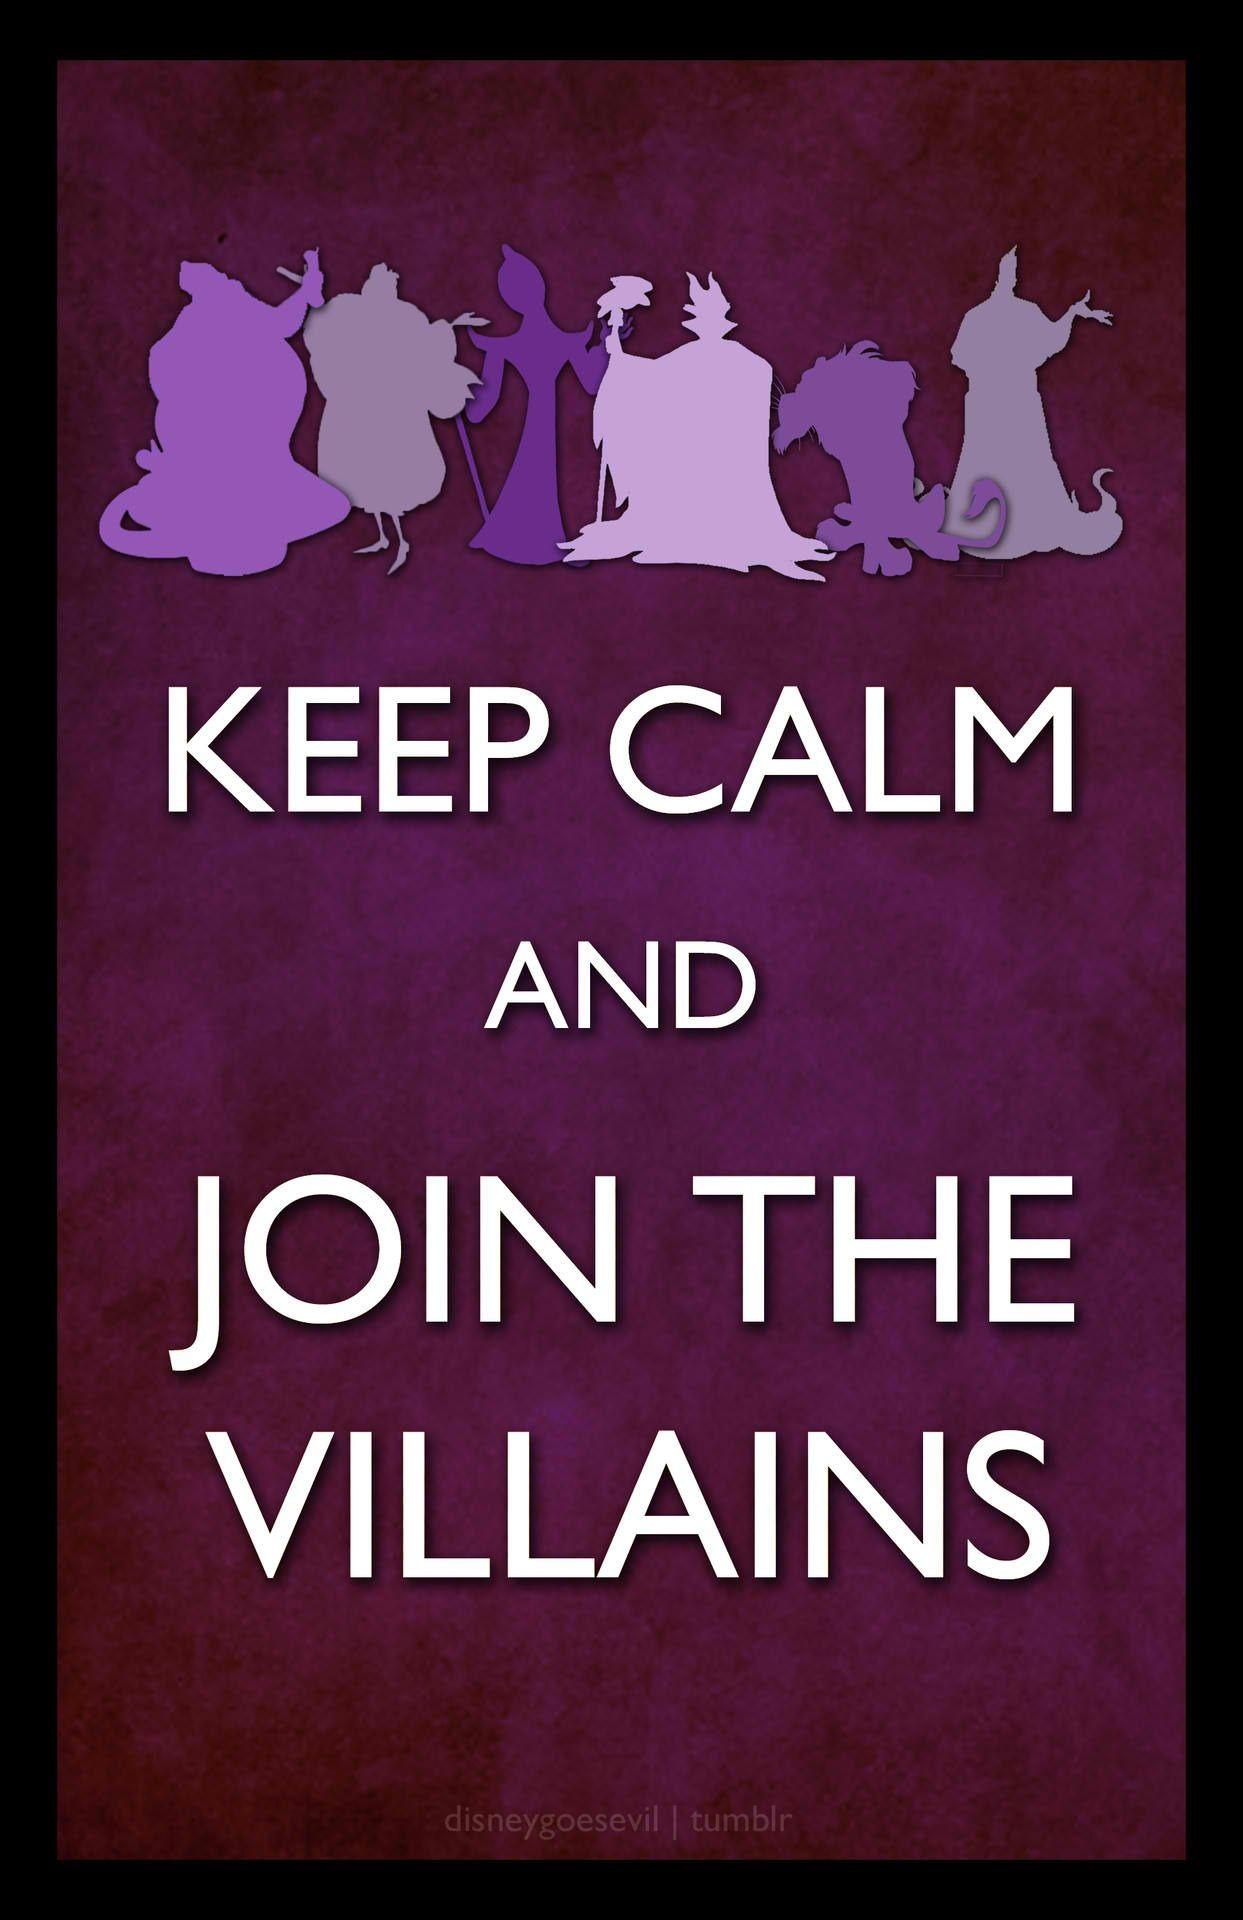 Kingdom Hearts Iphone Wallpaper Famous Disney Villain Quotes Quotesgram